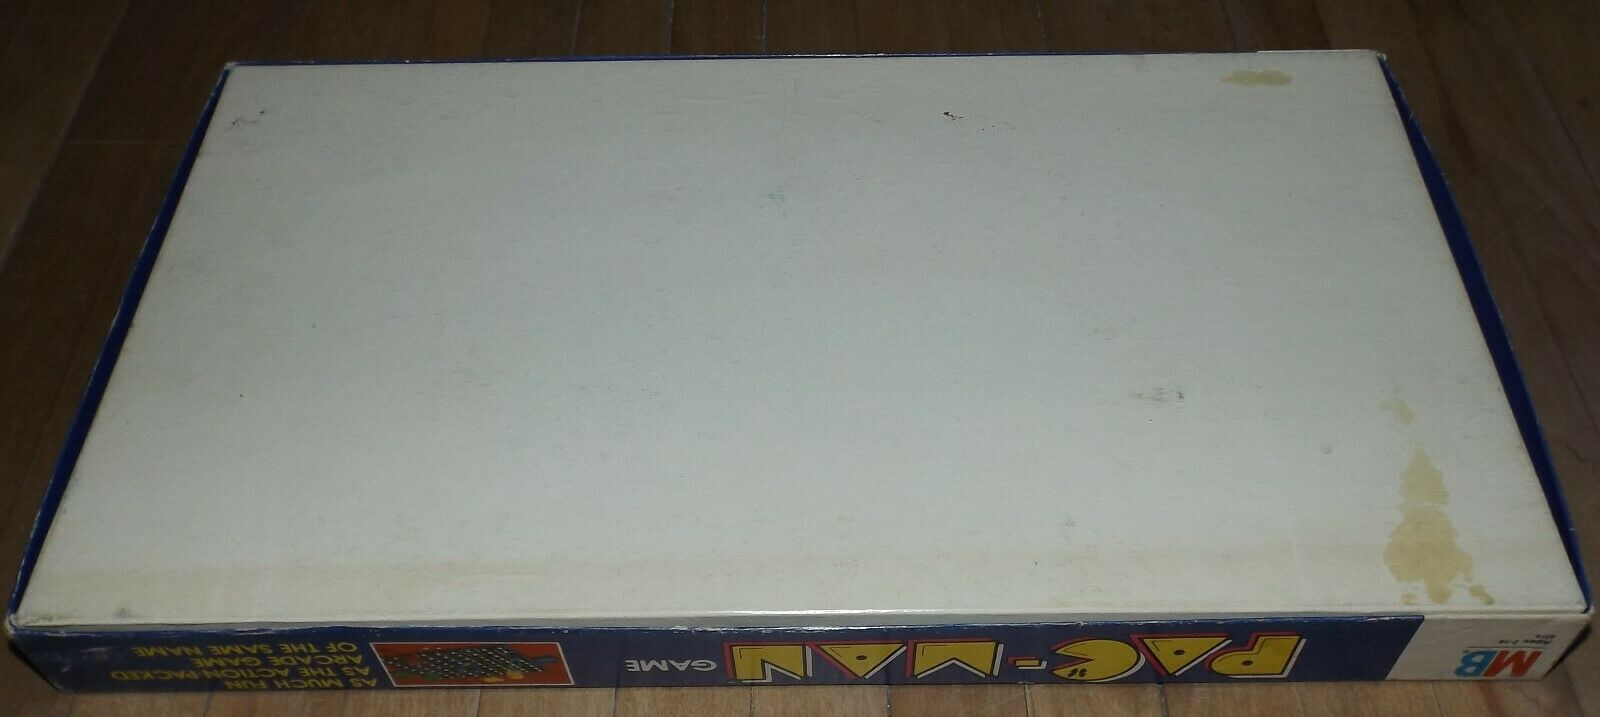 Vintage PAC-MAN 1982 1982 1982 board game - COMPLETE 829b23